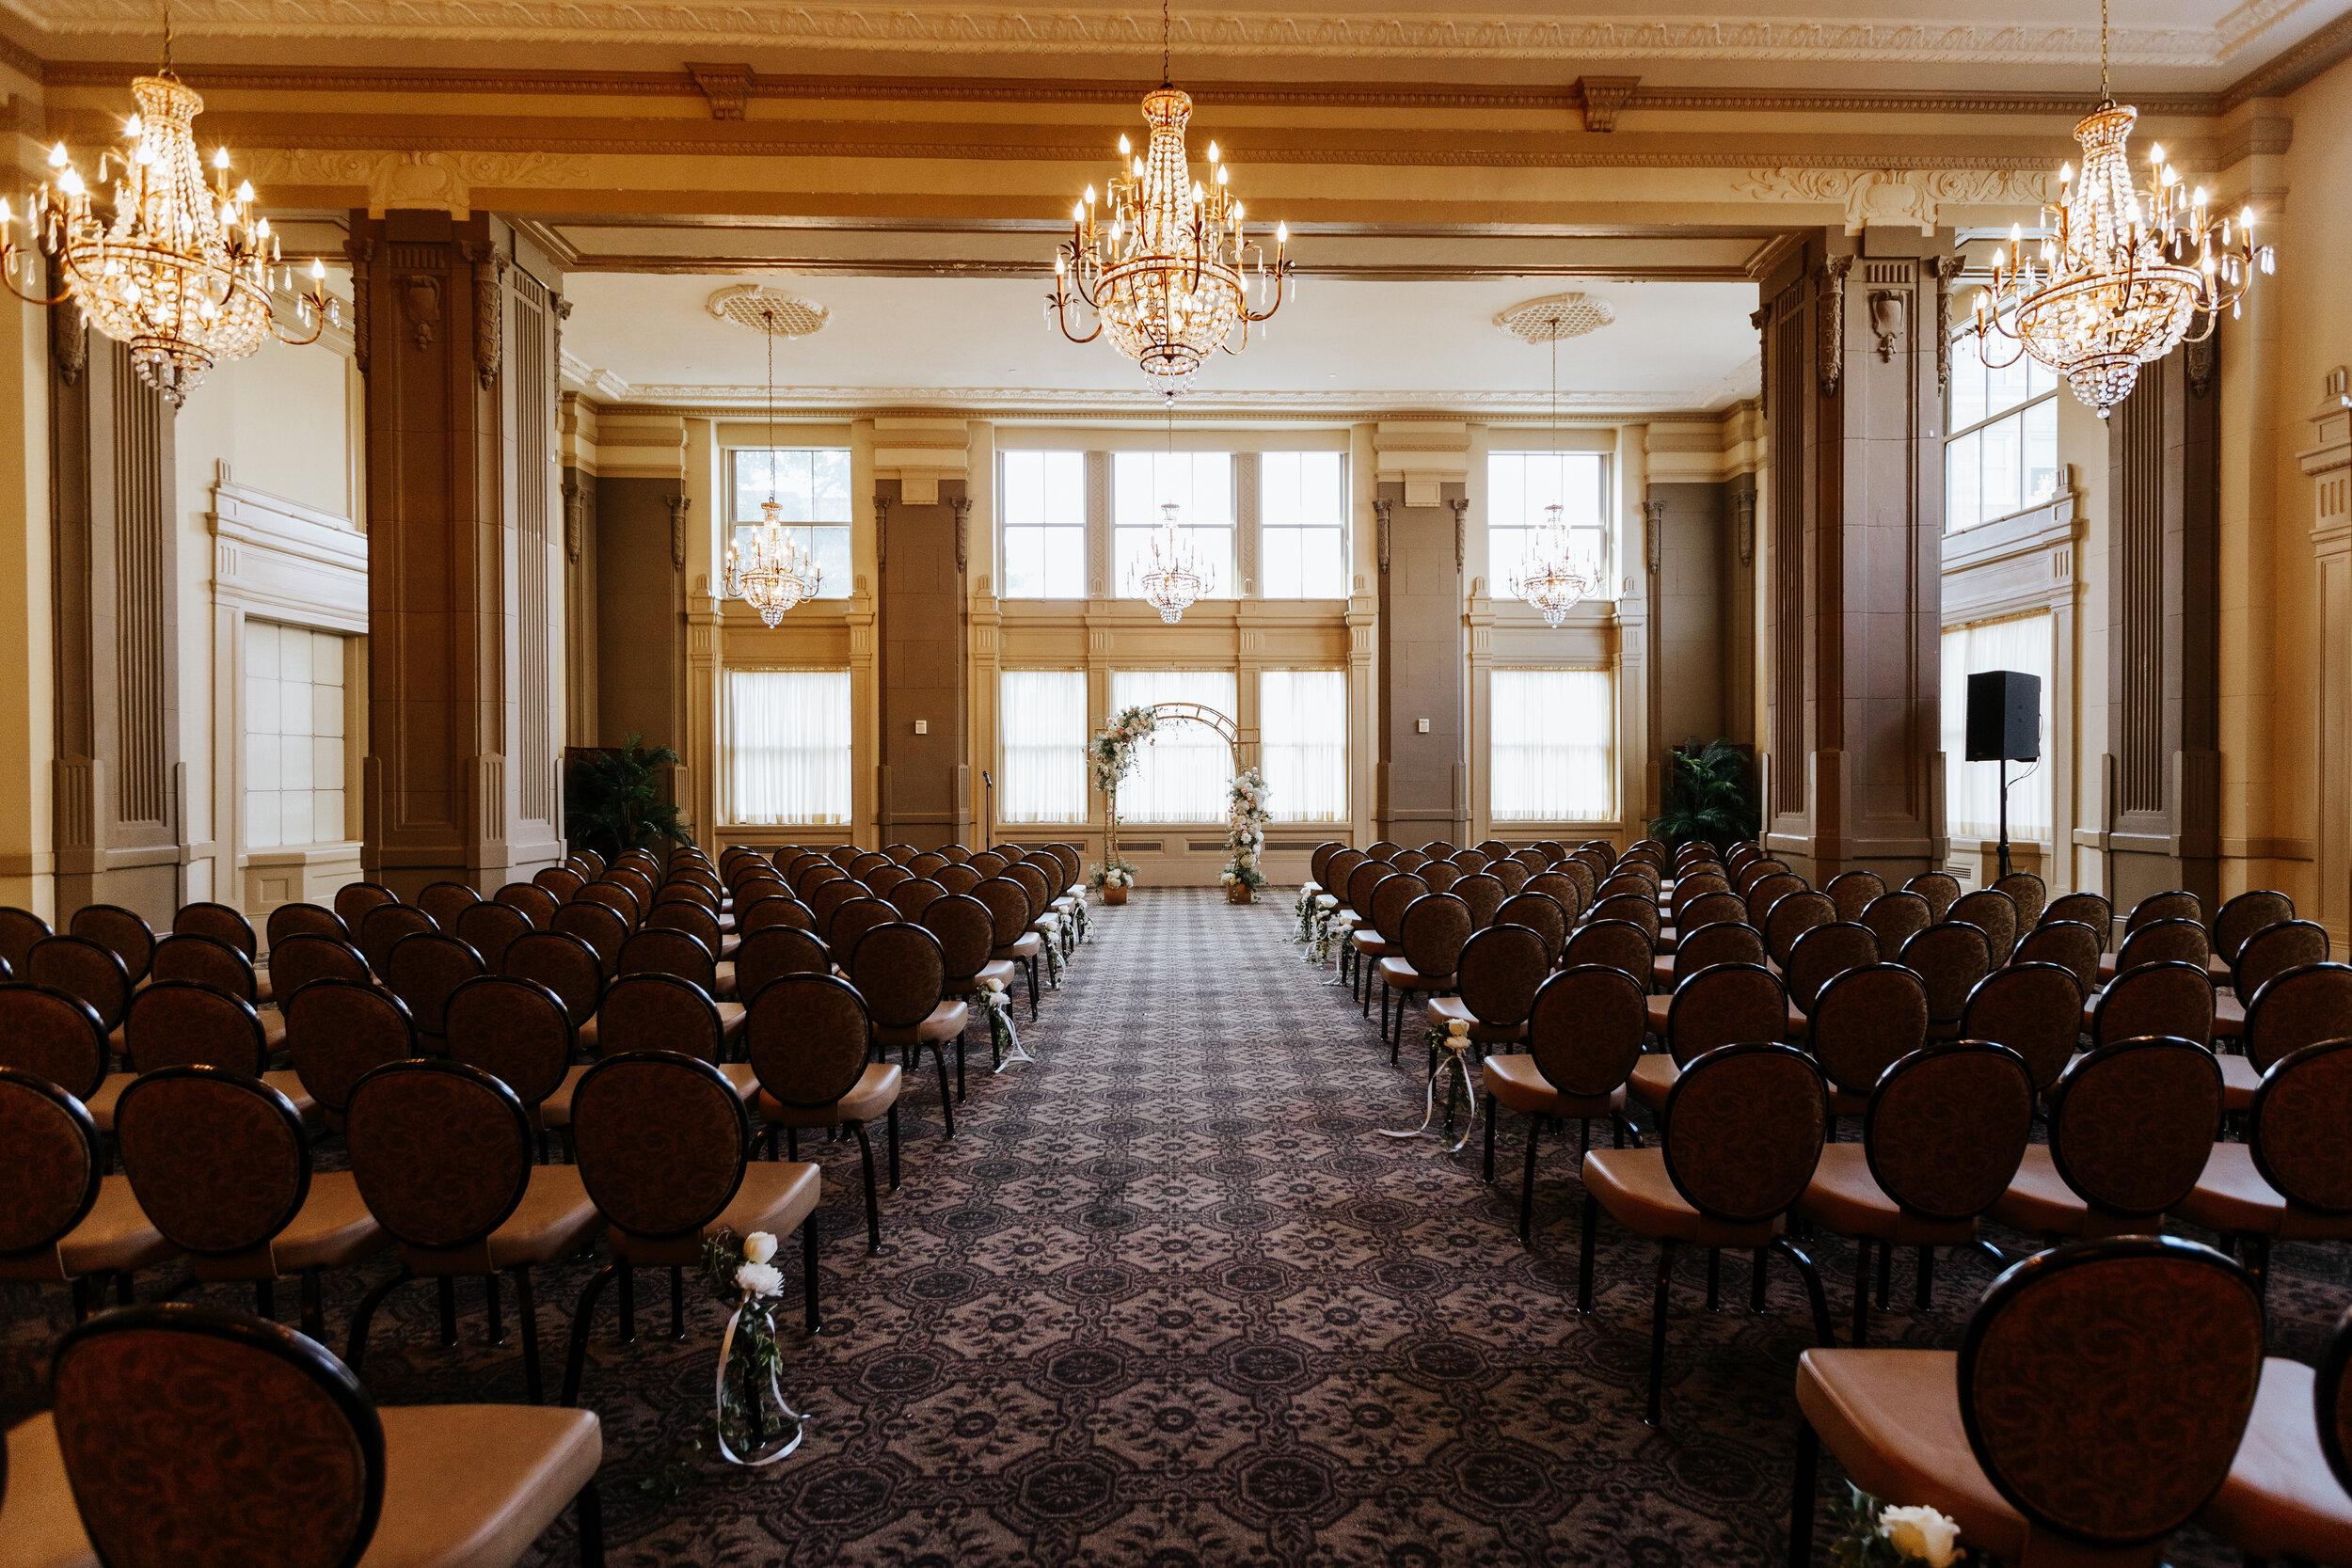 Cassie-Mrunal-Wedding-Quirk-Hotel-John-Marshall-Ballrooms-Richmond-Virginia-Photography-by-V-62.jpg